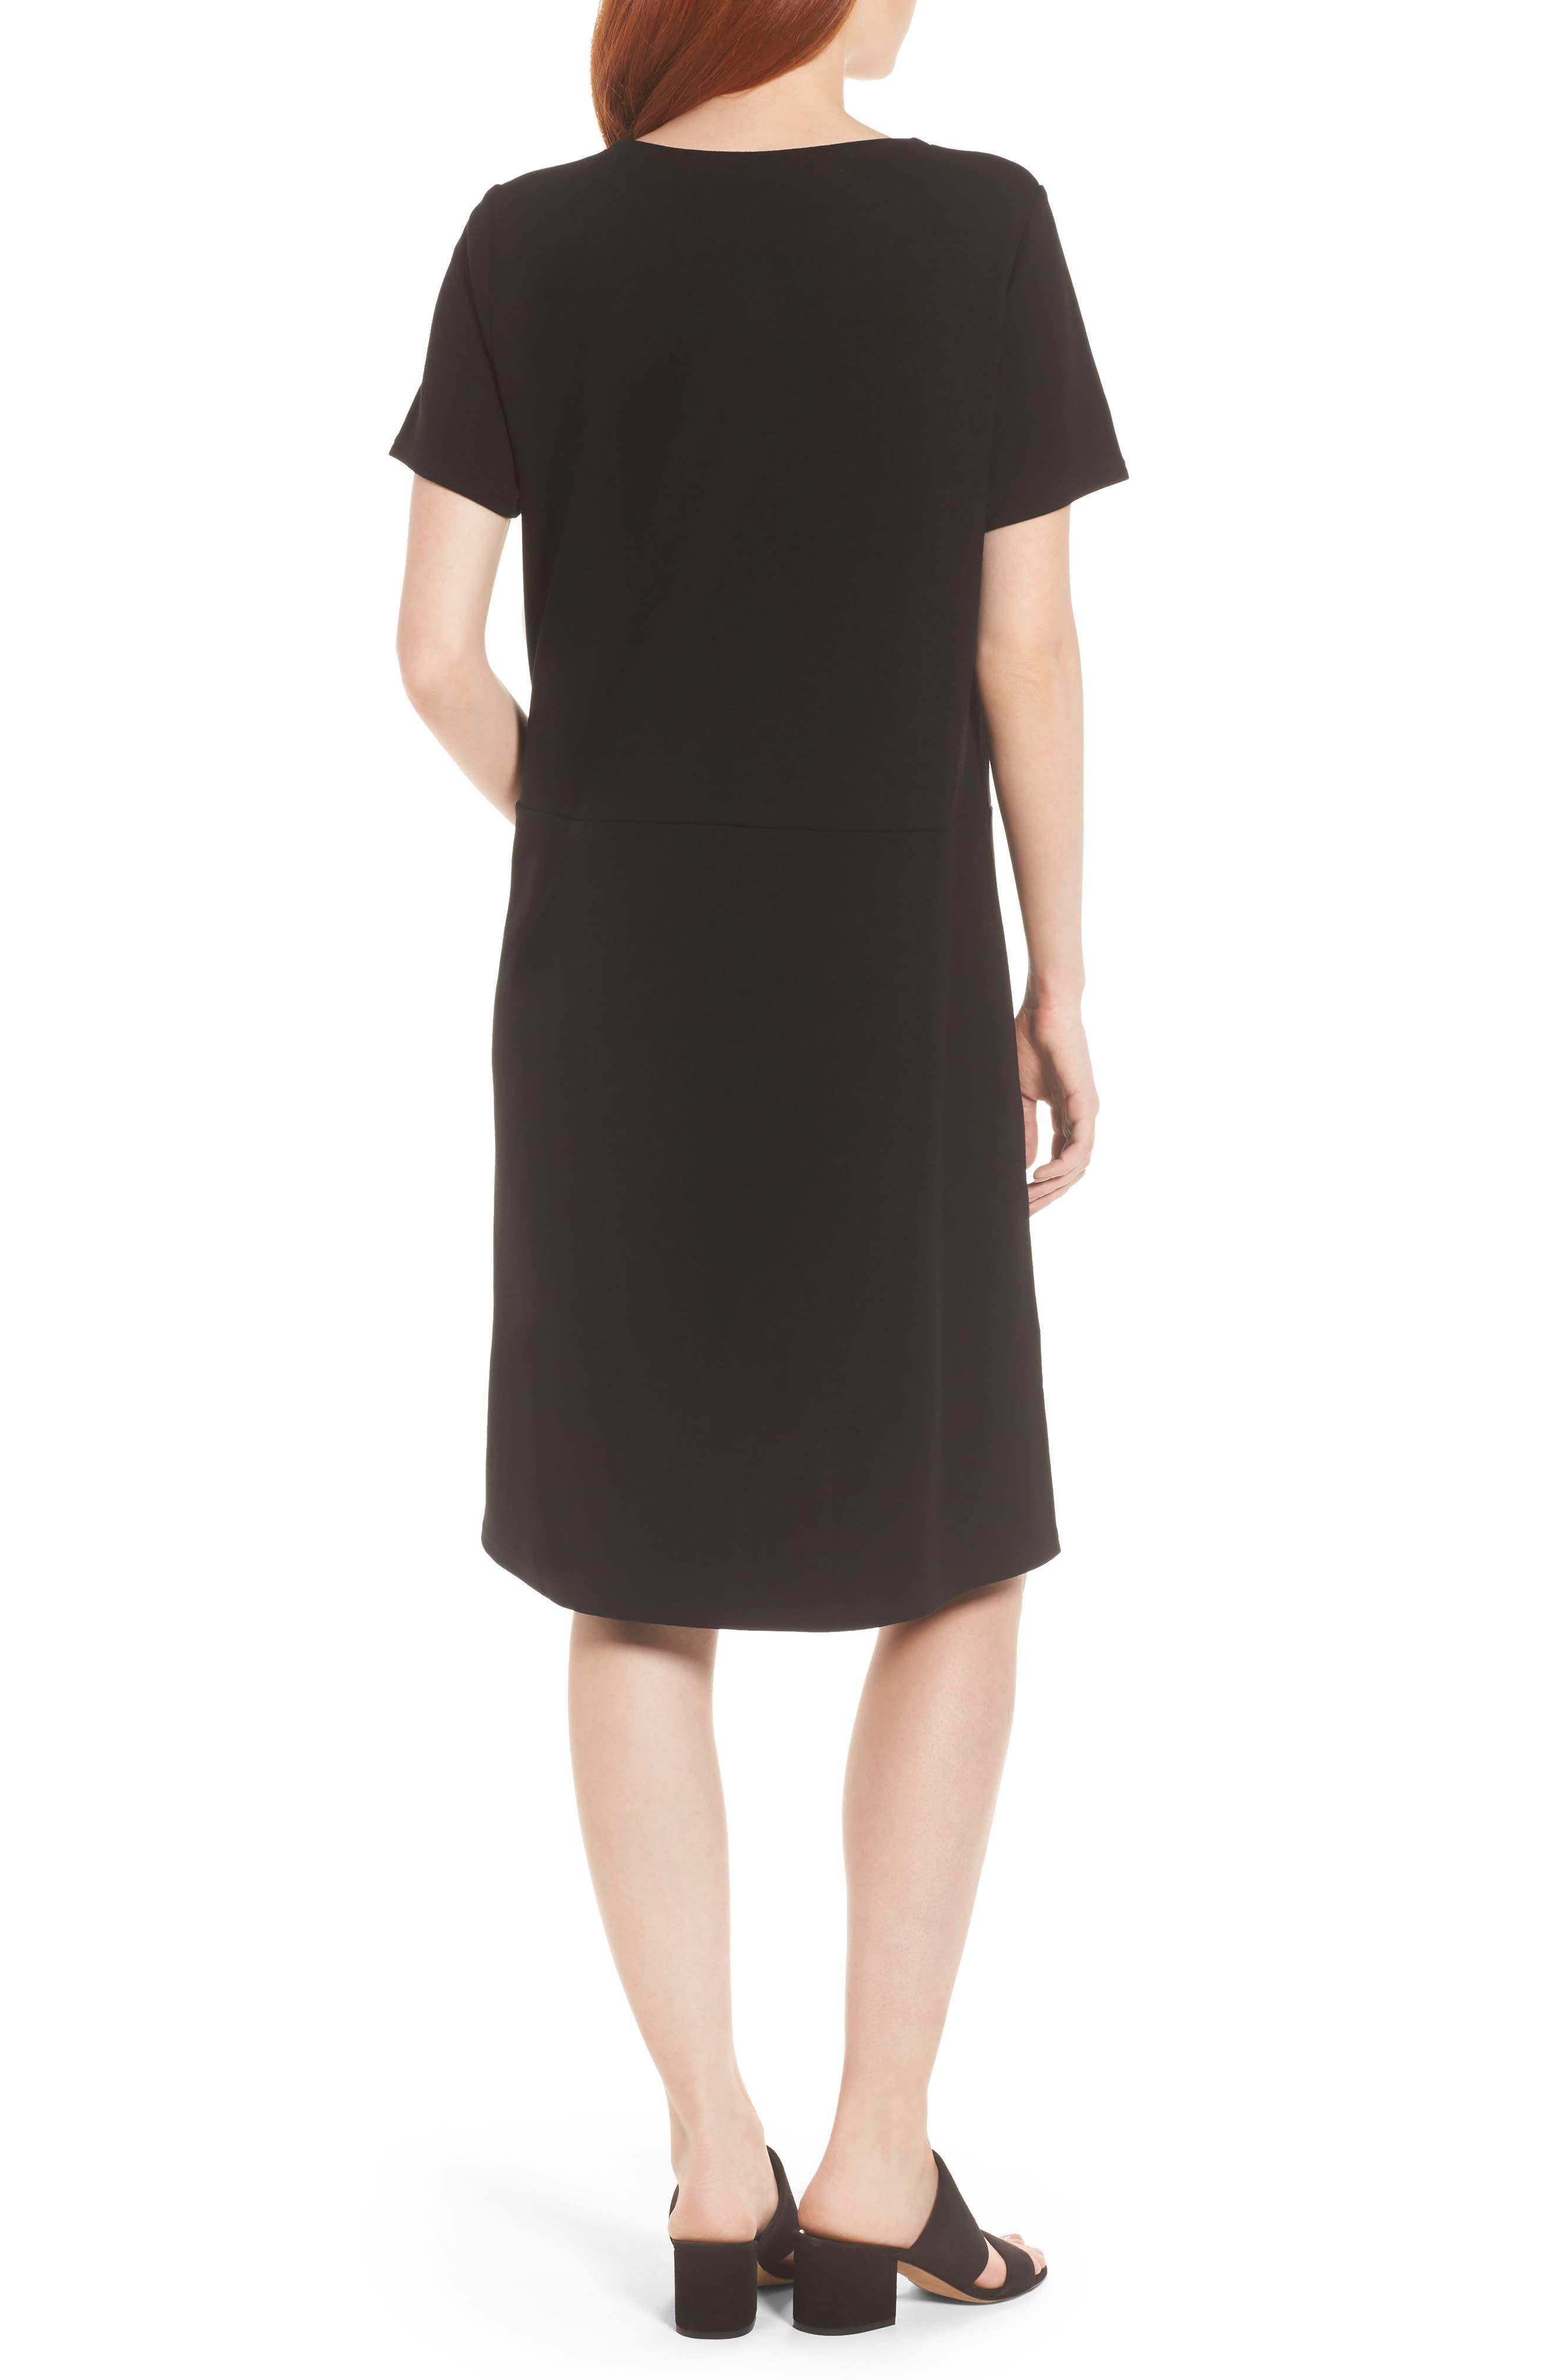 Tencel<sup>®</sup> Lyocell Blend Knit Shift Dress,                             Alternate thumbnail 2, color,                             Black